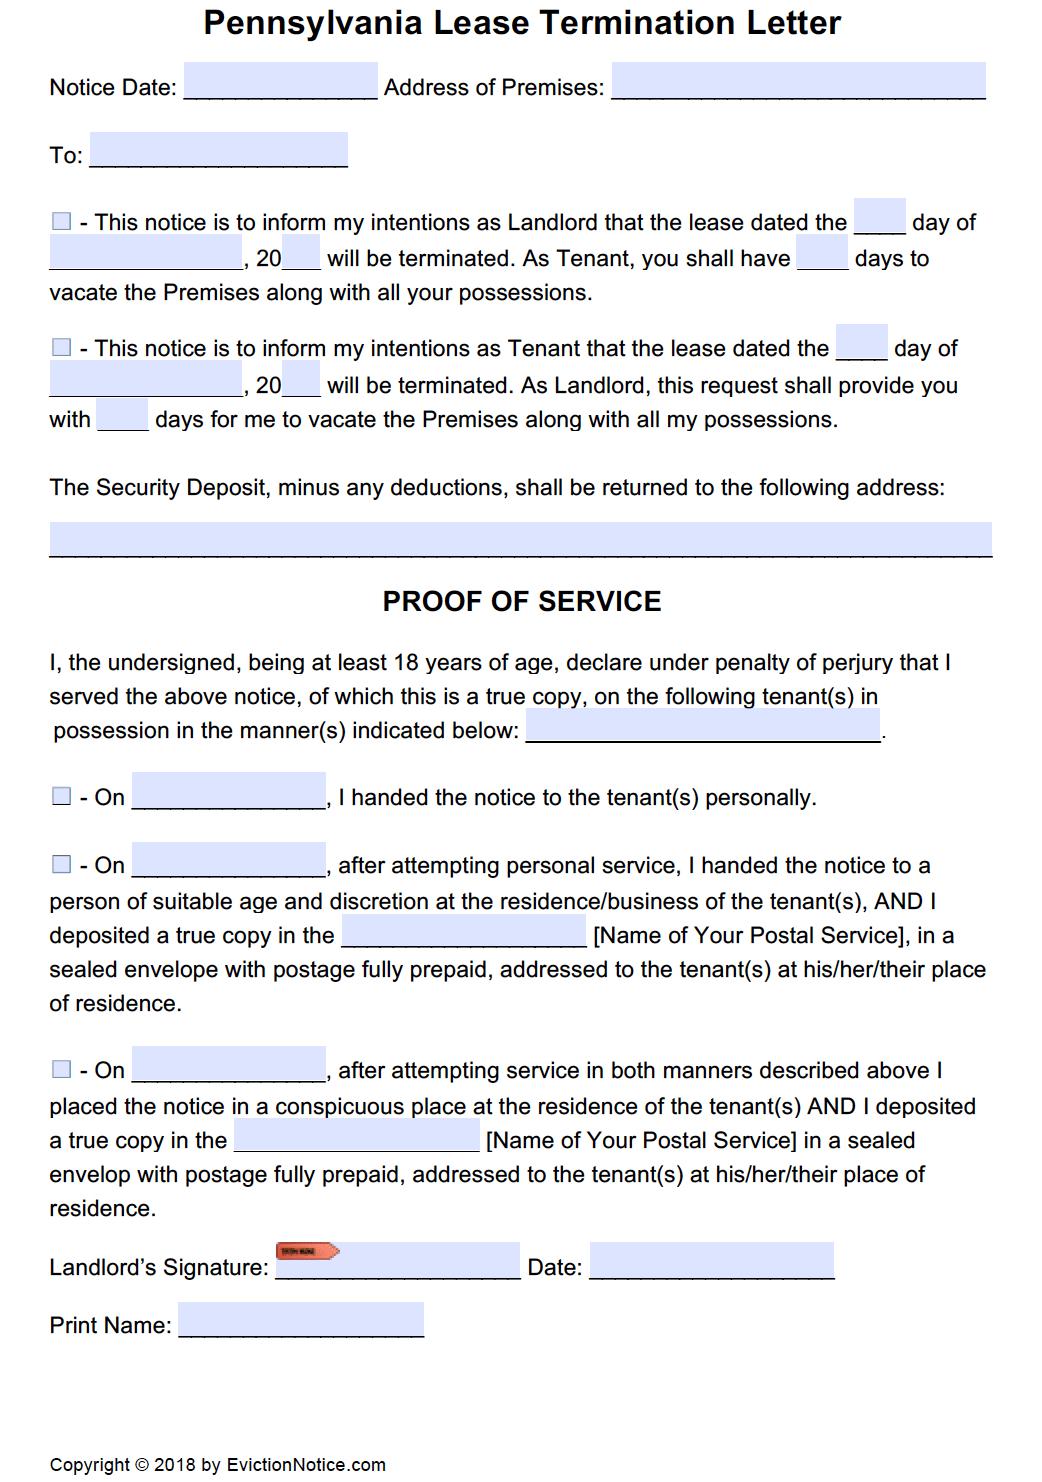 Free Pennsylvania Eviction Notice Templates | Pa Eviction Process - Free Printable Eviction Notice Pa